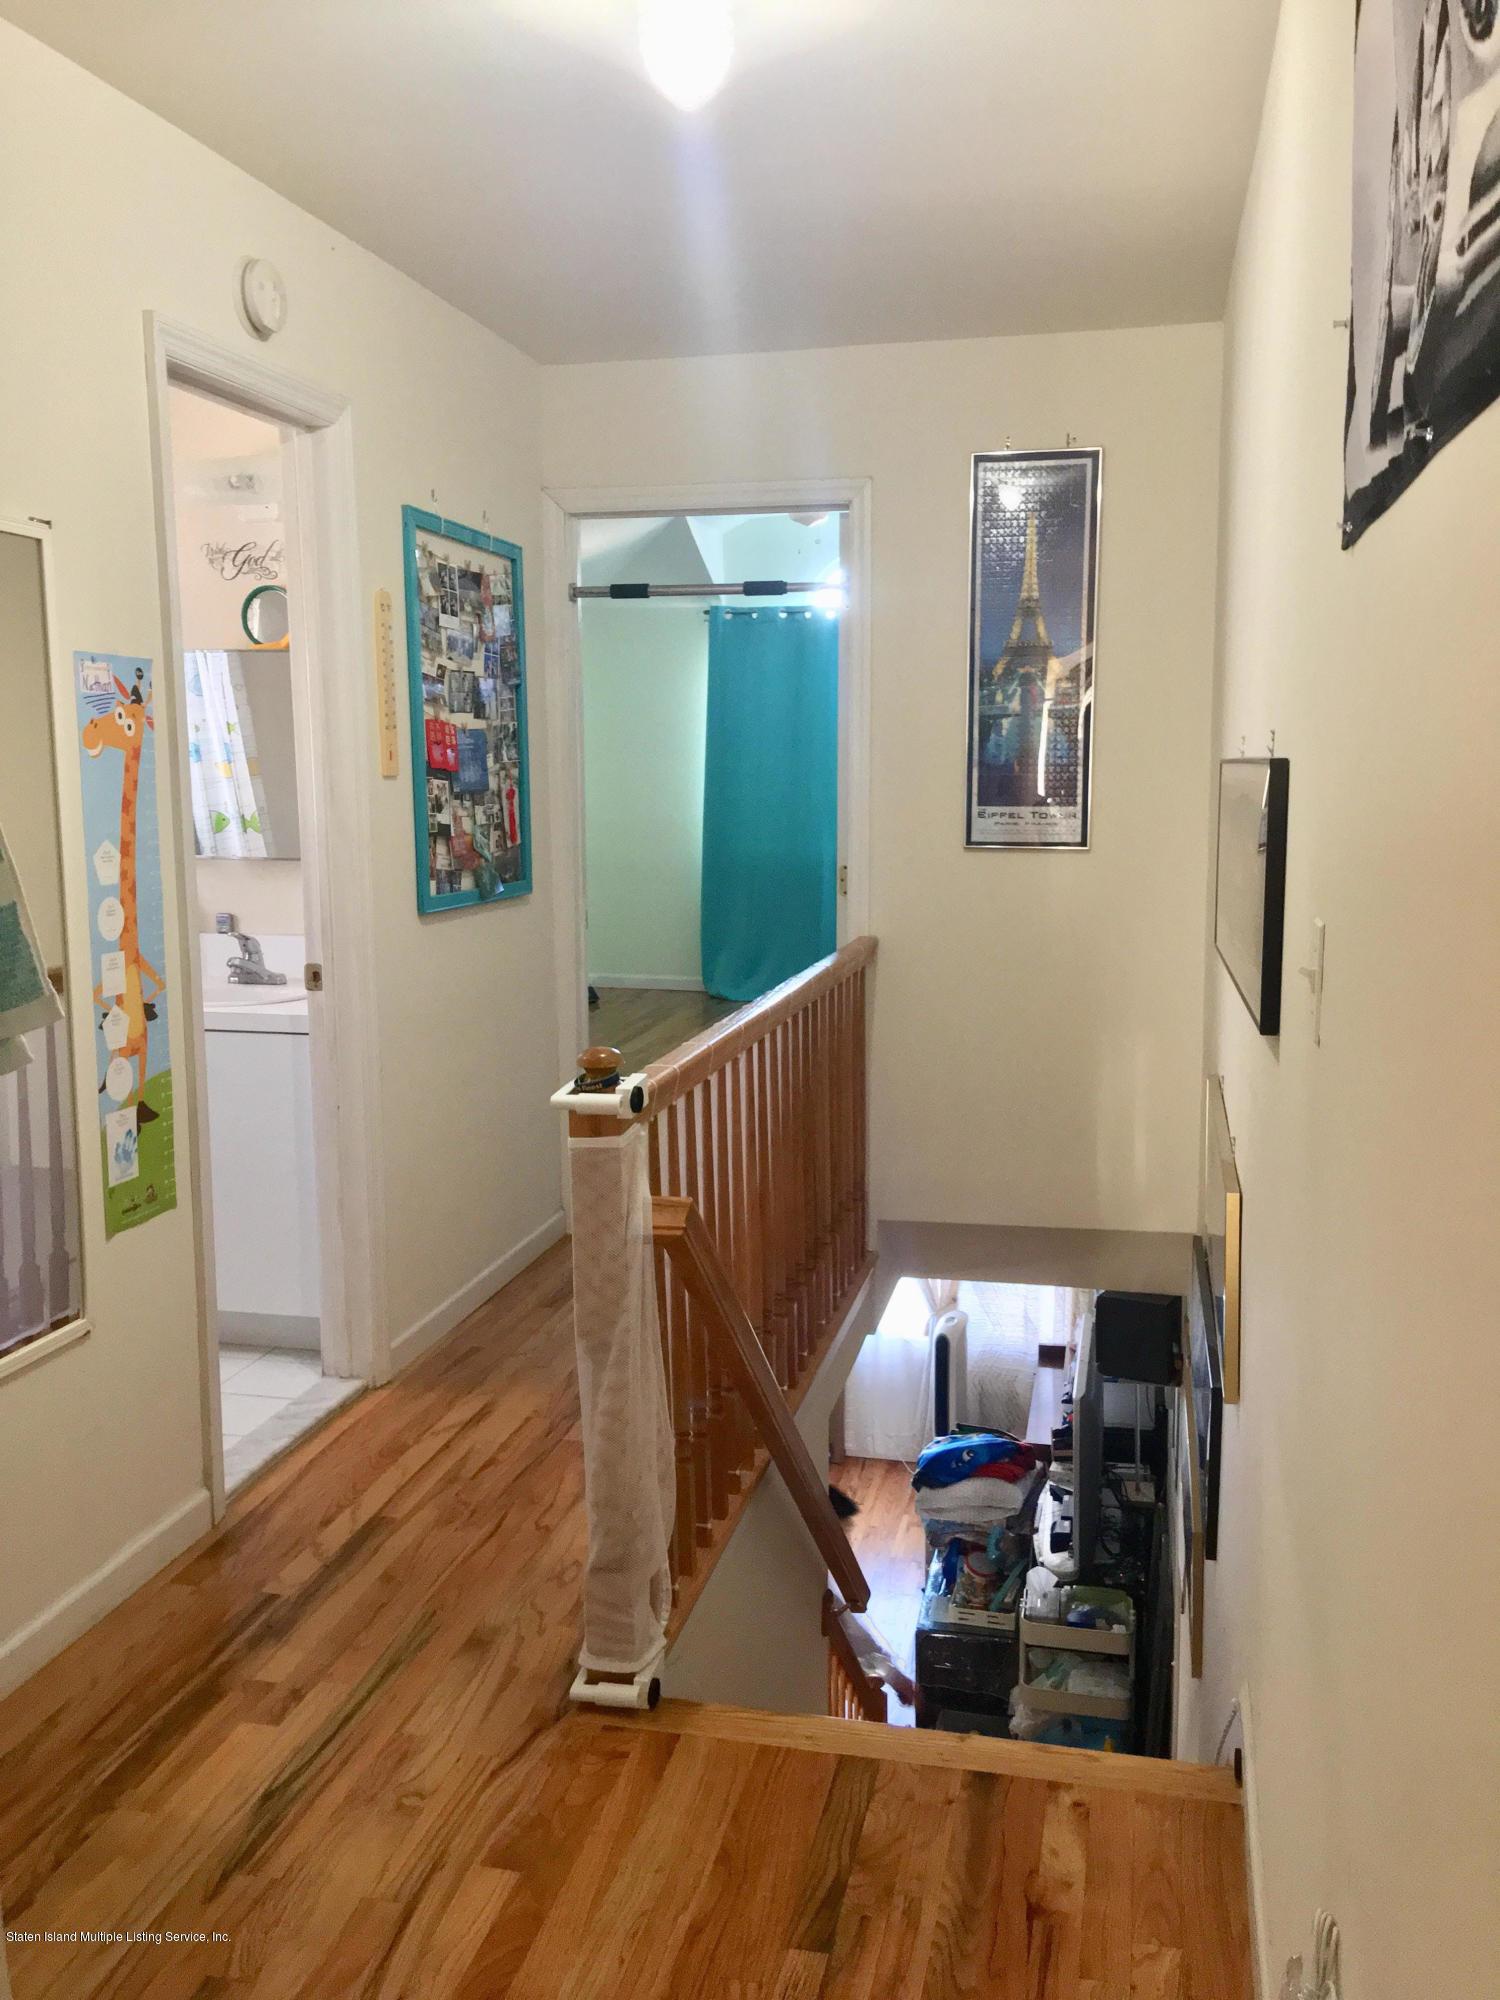 Single Family - Semi-Attached 261 Moreland Street  Staten Island, NY 10306, MLS-1132528-7